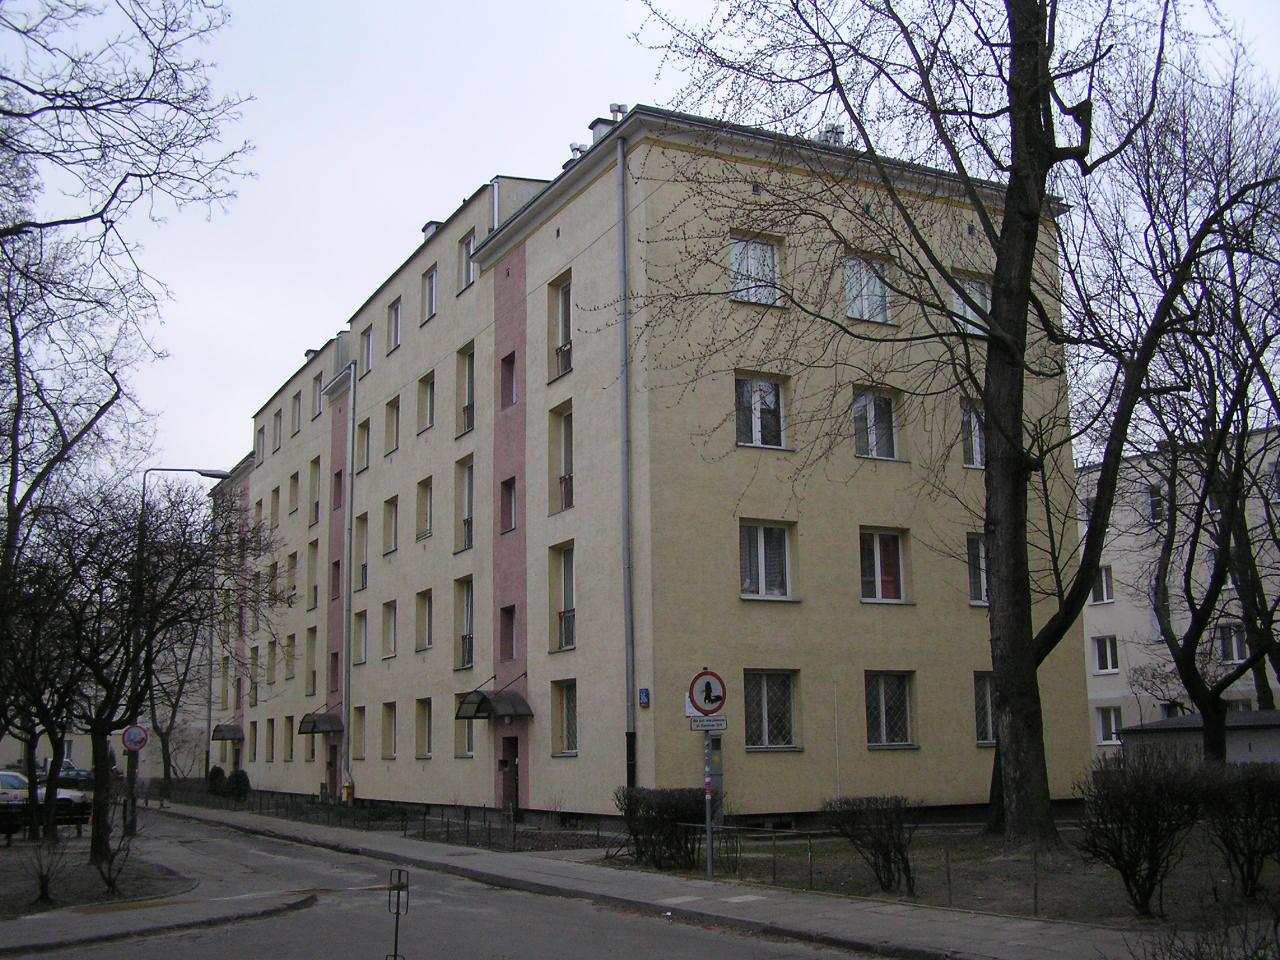 Siennicka 36A